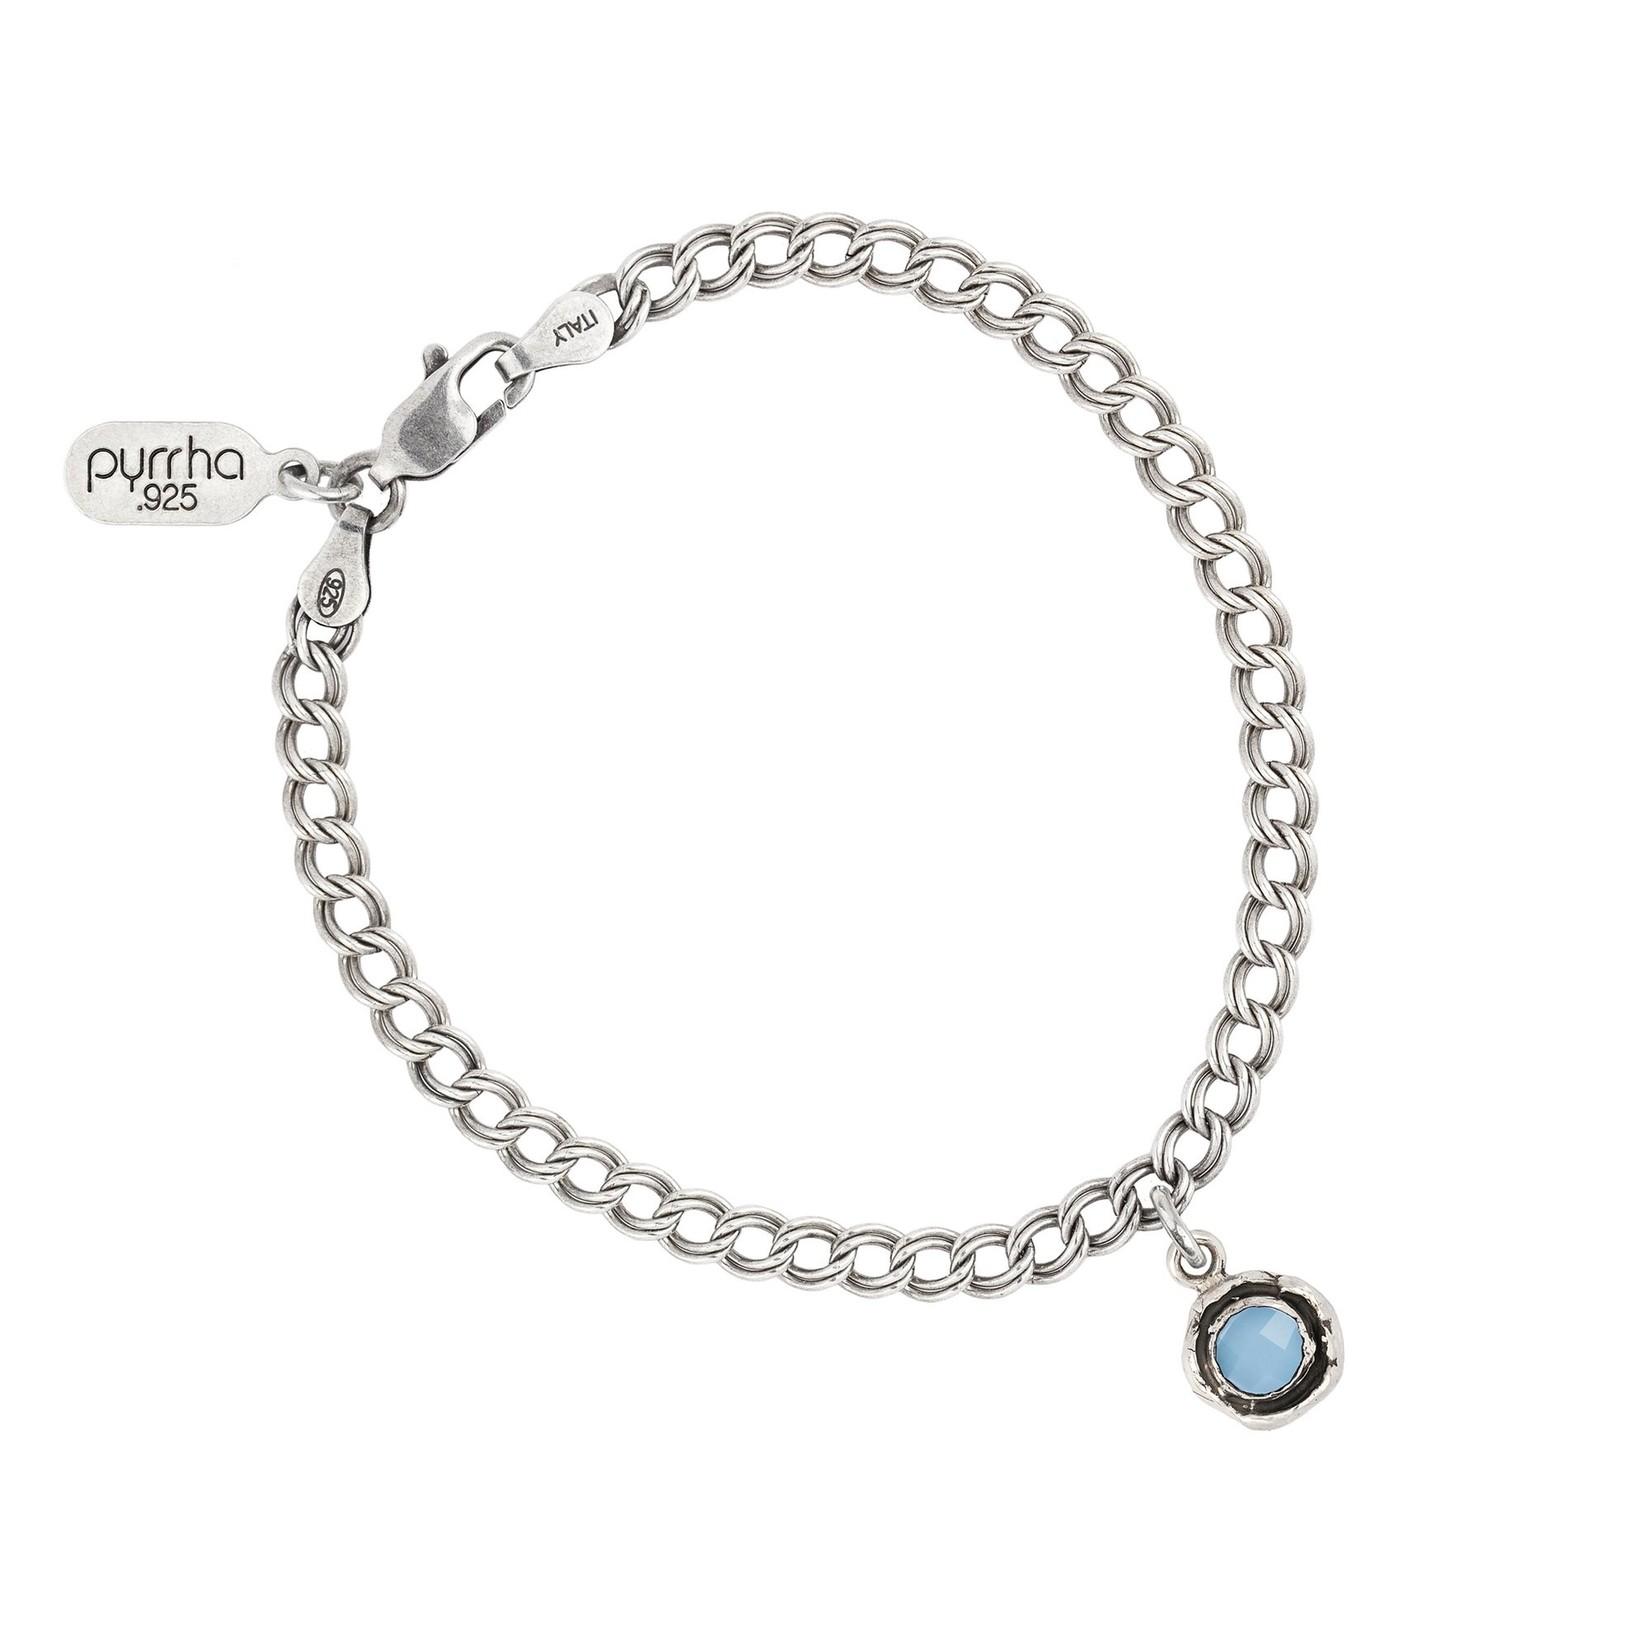 Pyrrha Chalcedony Small Faceted Stone Talisman Chain Bracelet